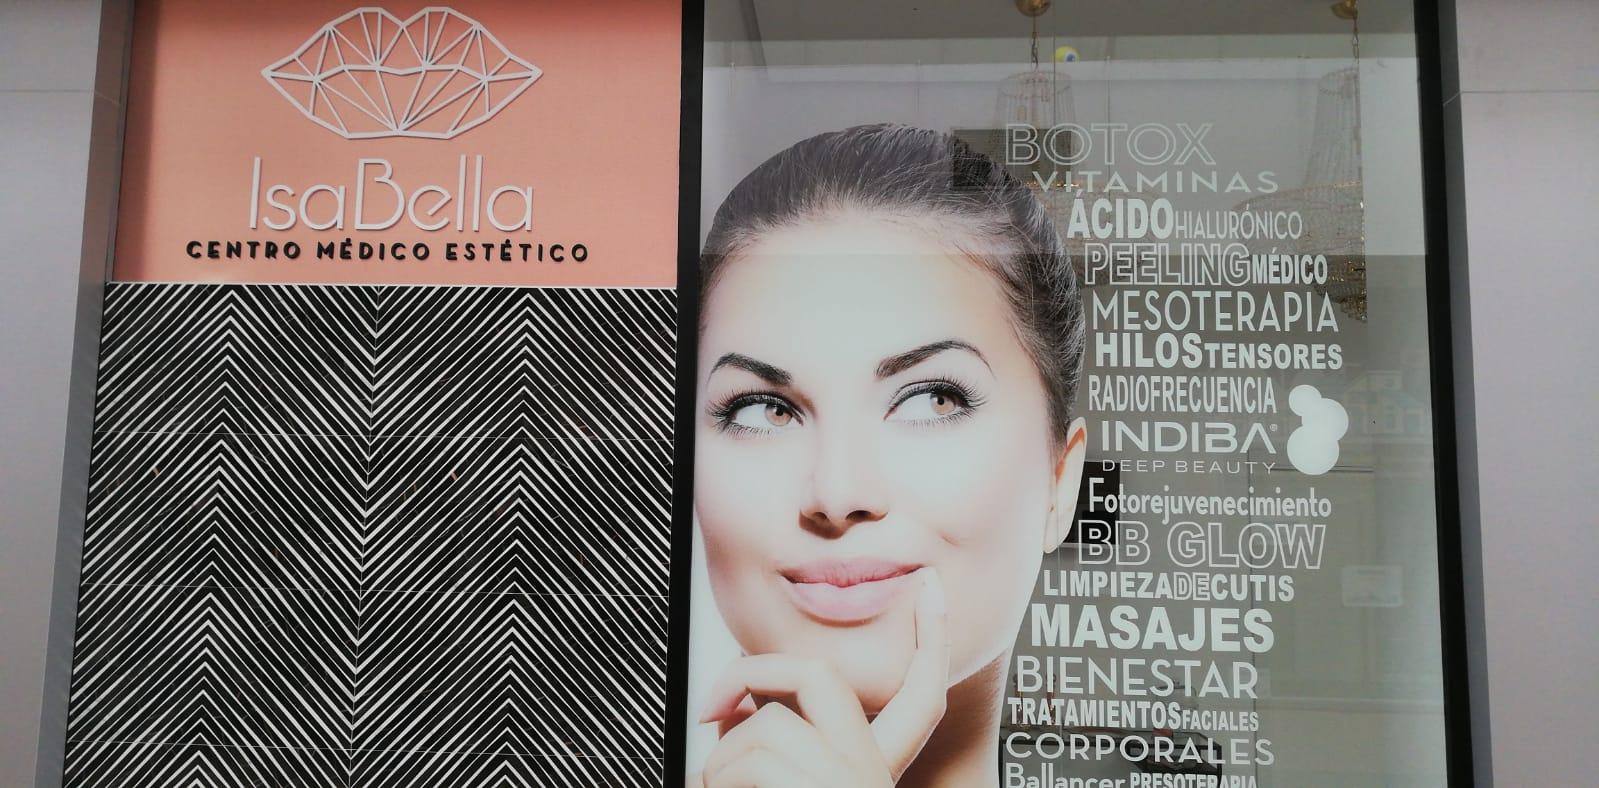 Isabella Centro Médico Estético